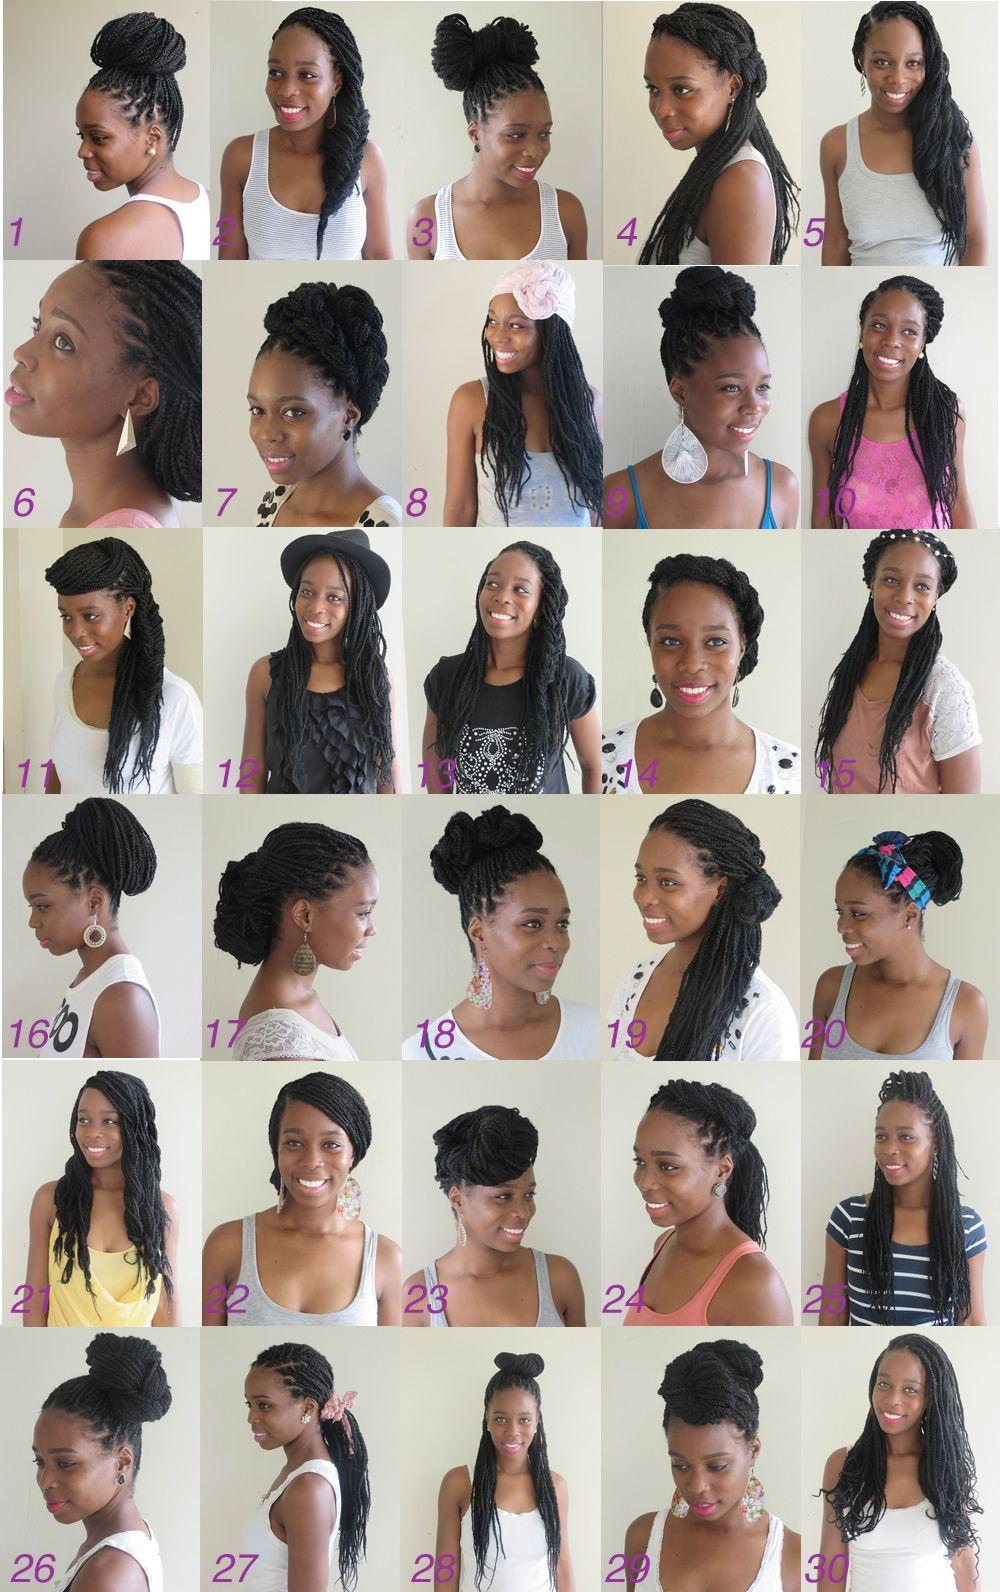 Box Braids Haarstijl De Flower Pin Video Tutorial Myblackhair Box Braids Styling Natural Hair Styles Braided Hairstyles